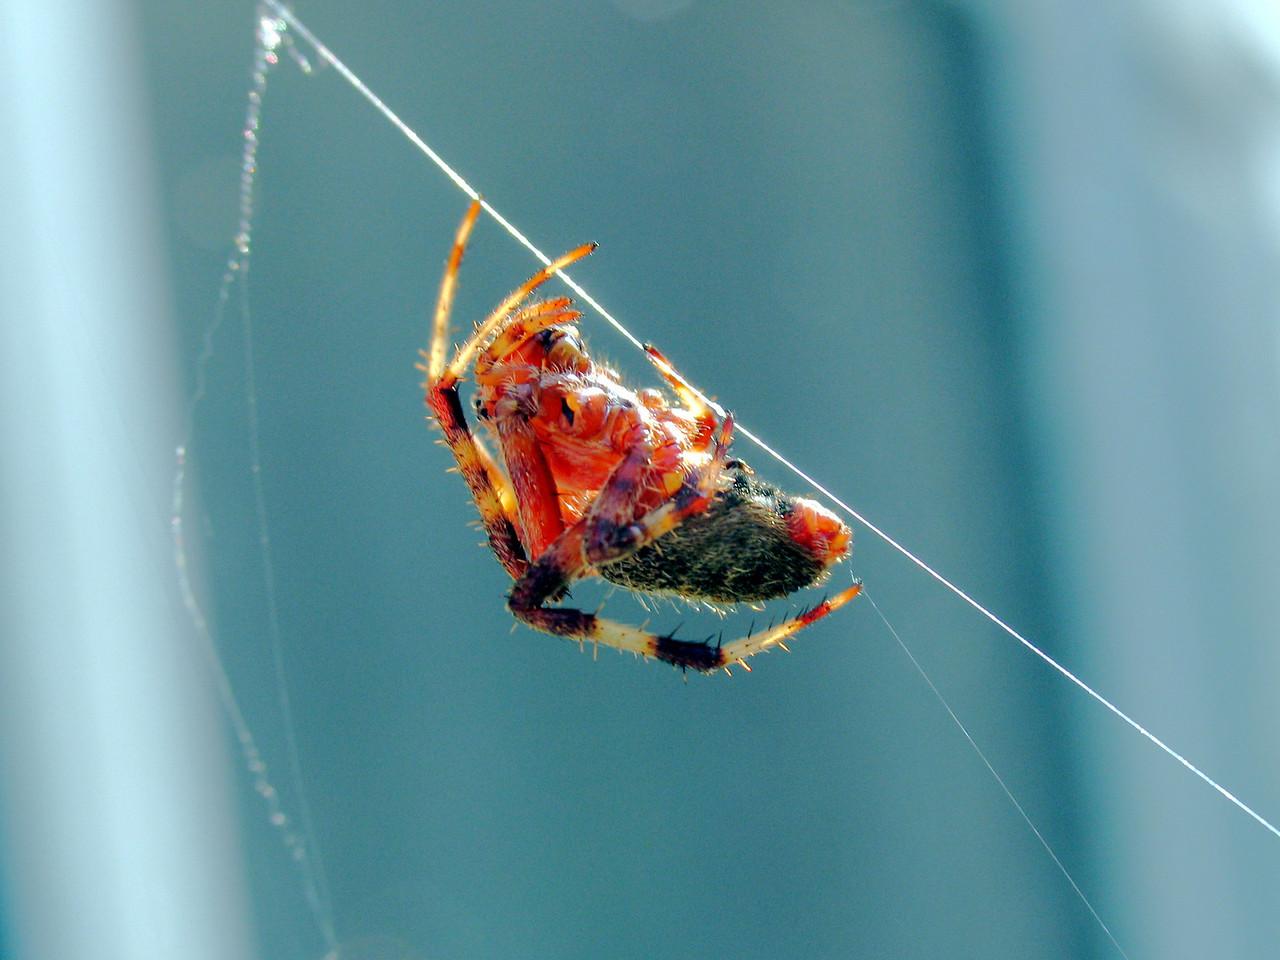 Spider on back patio - September 2005